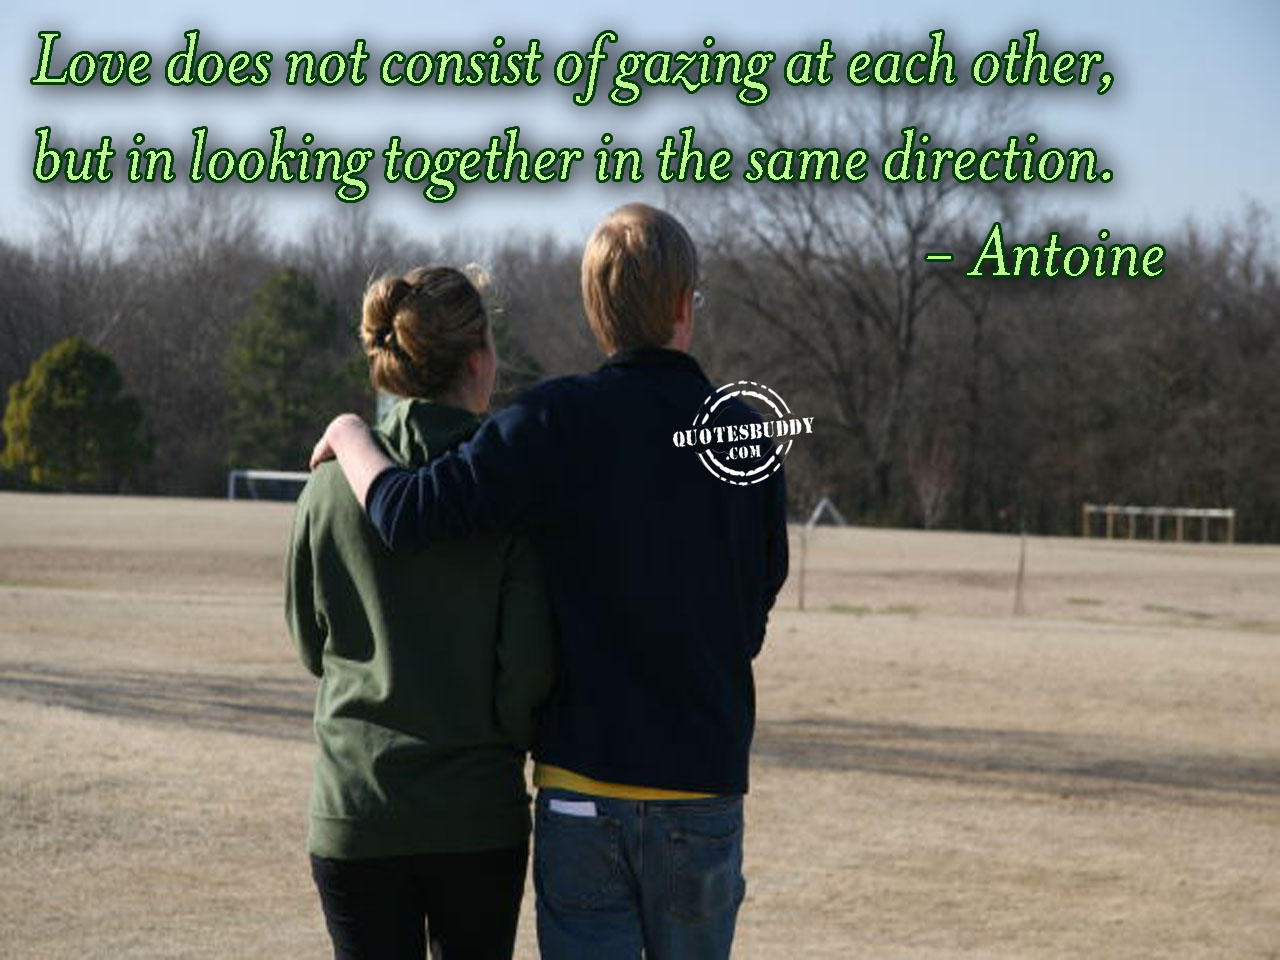 Anniversary quote #5